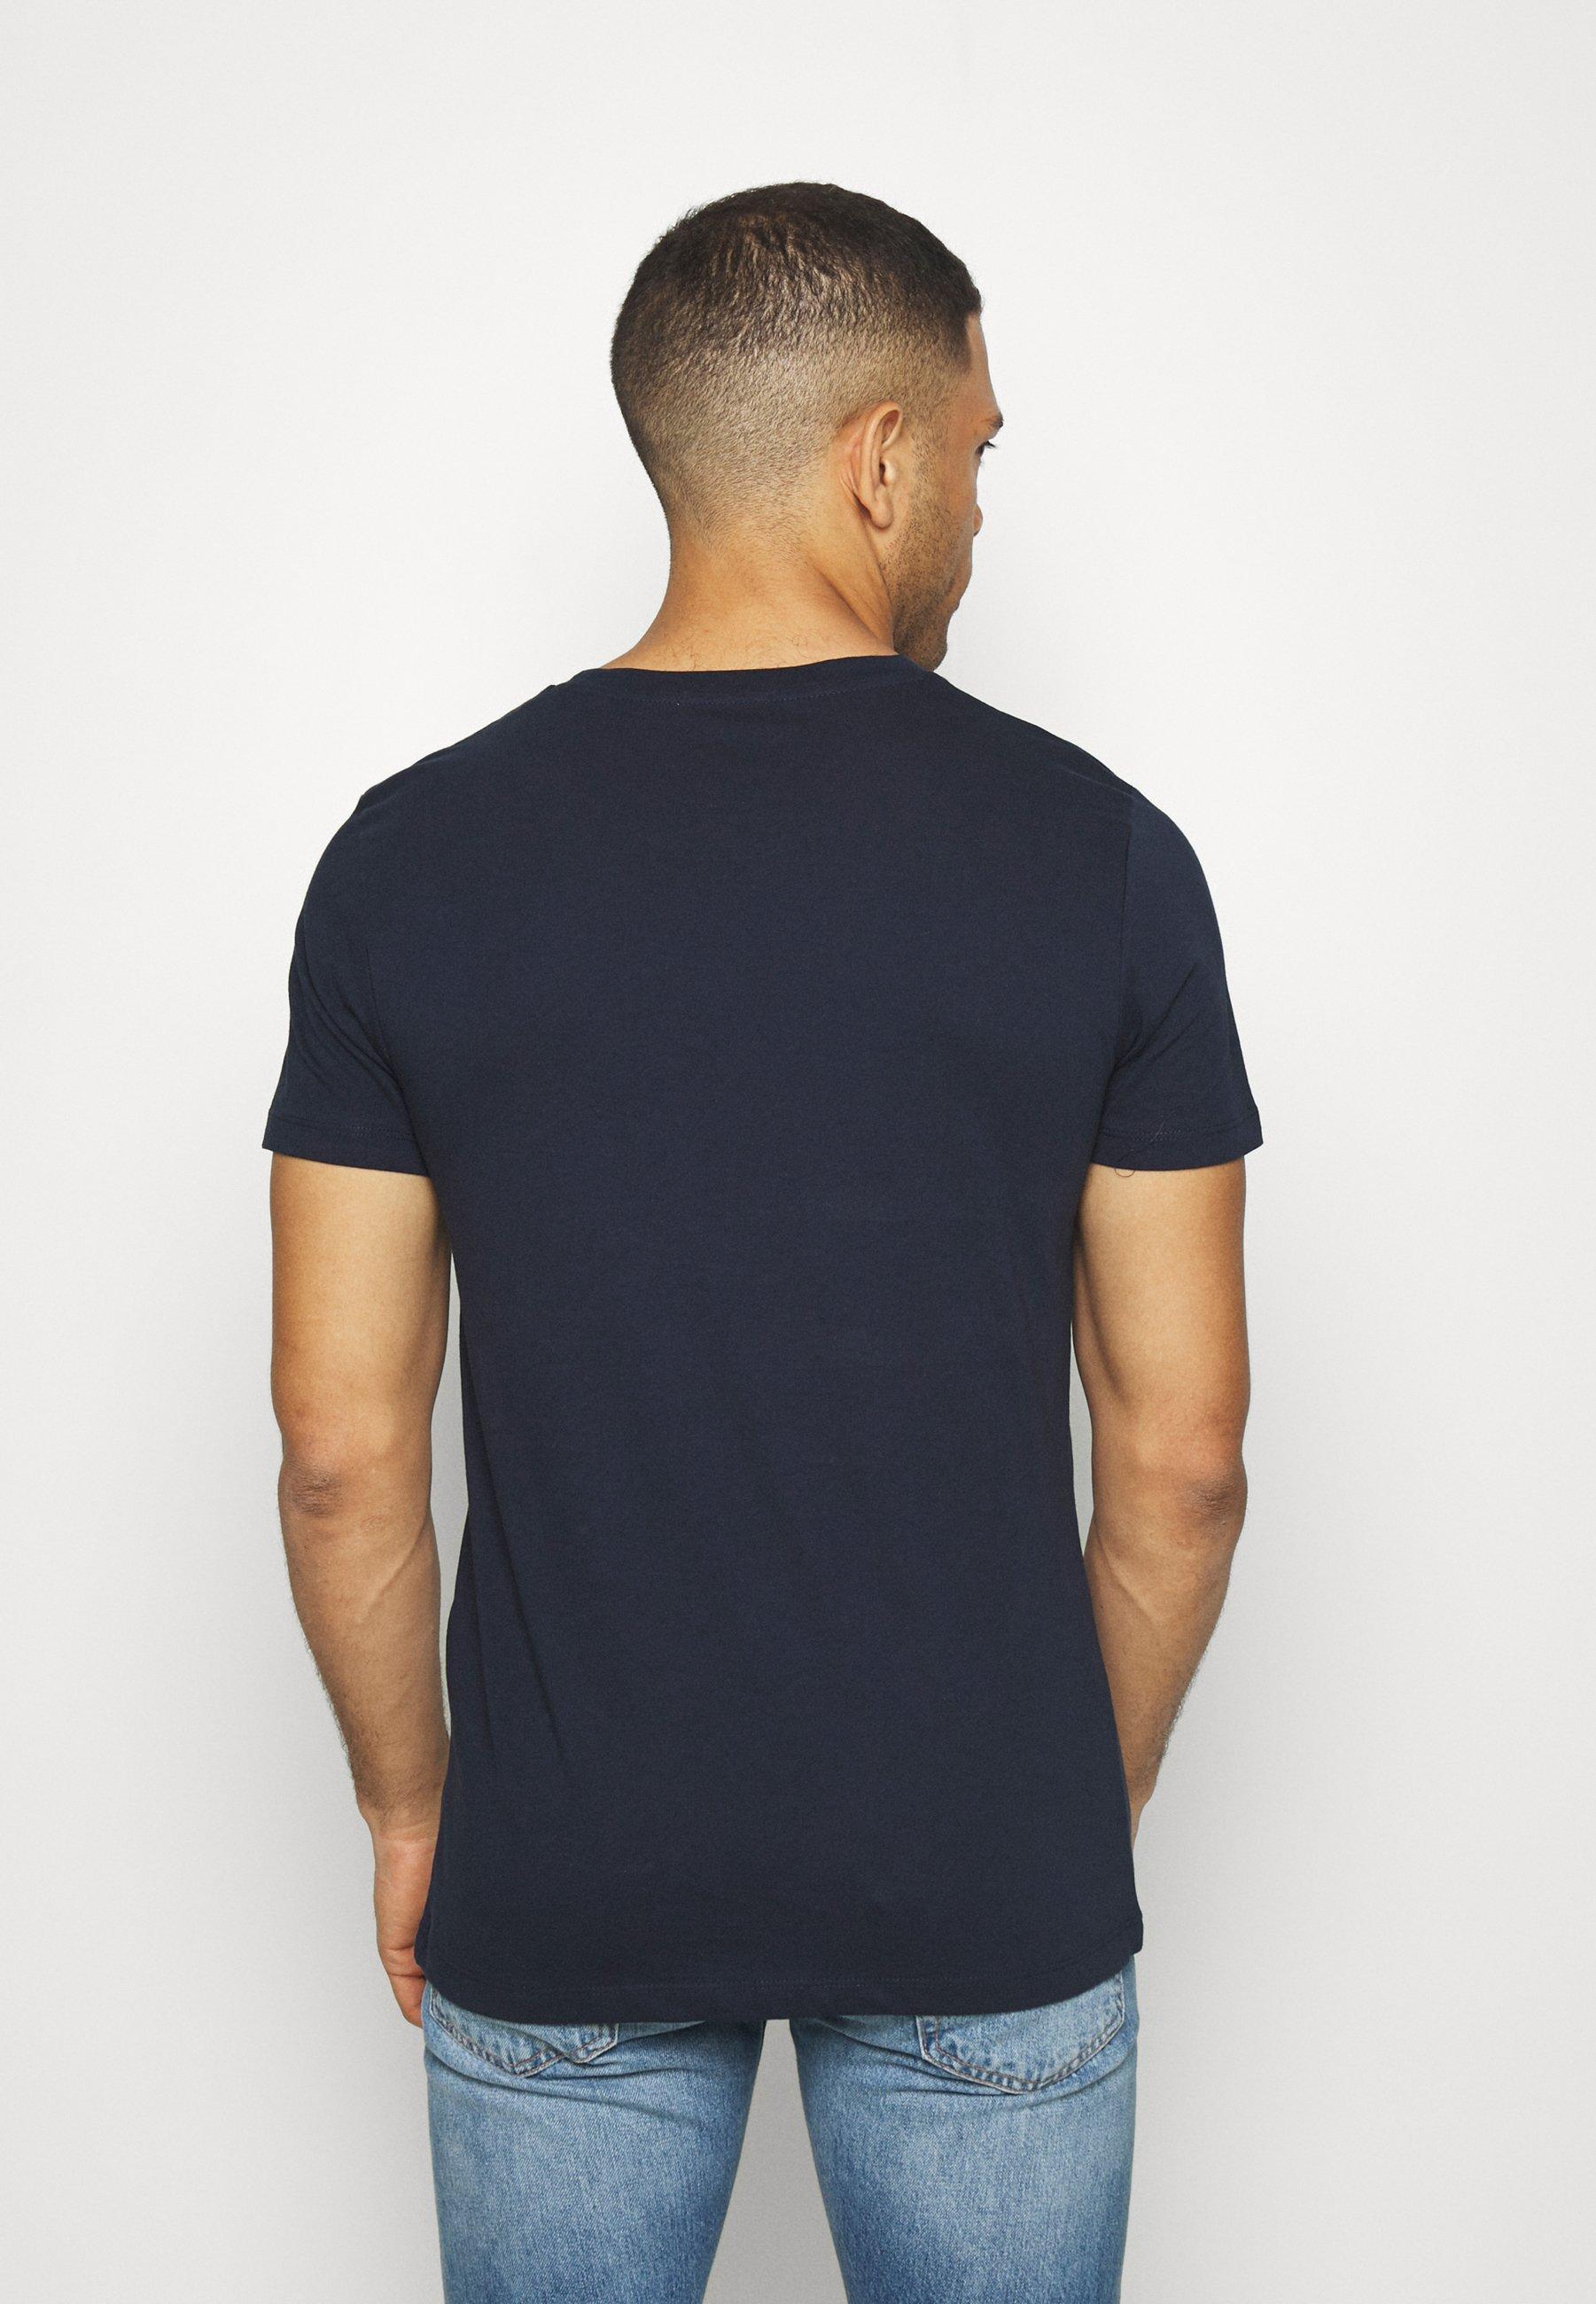 TOM TAILOR DENIM Print T-shirt - sky captain blue SjiVT